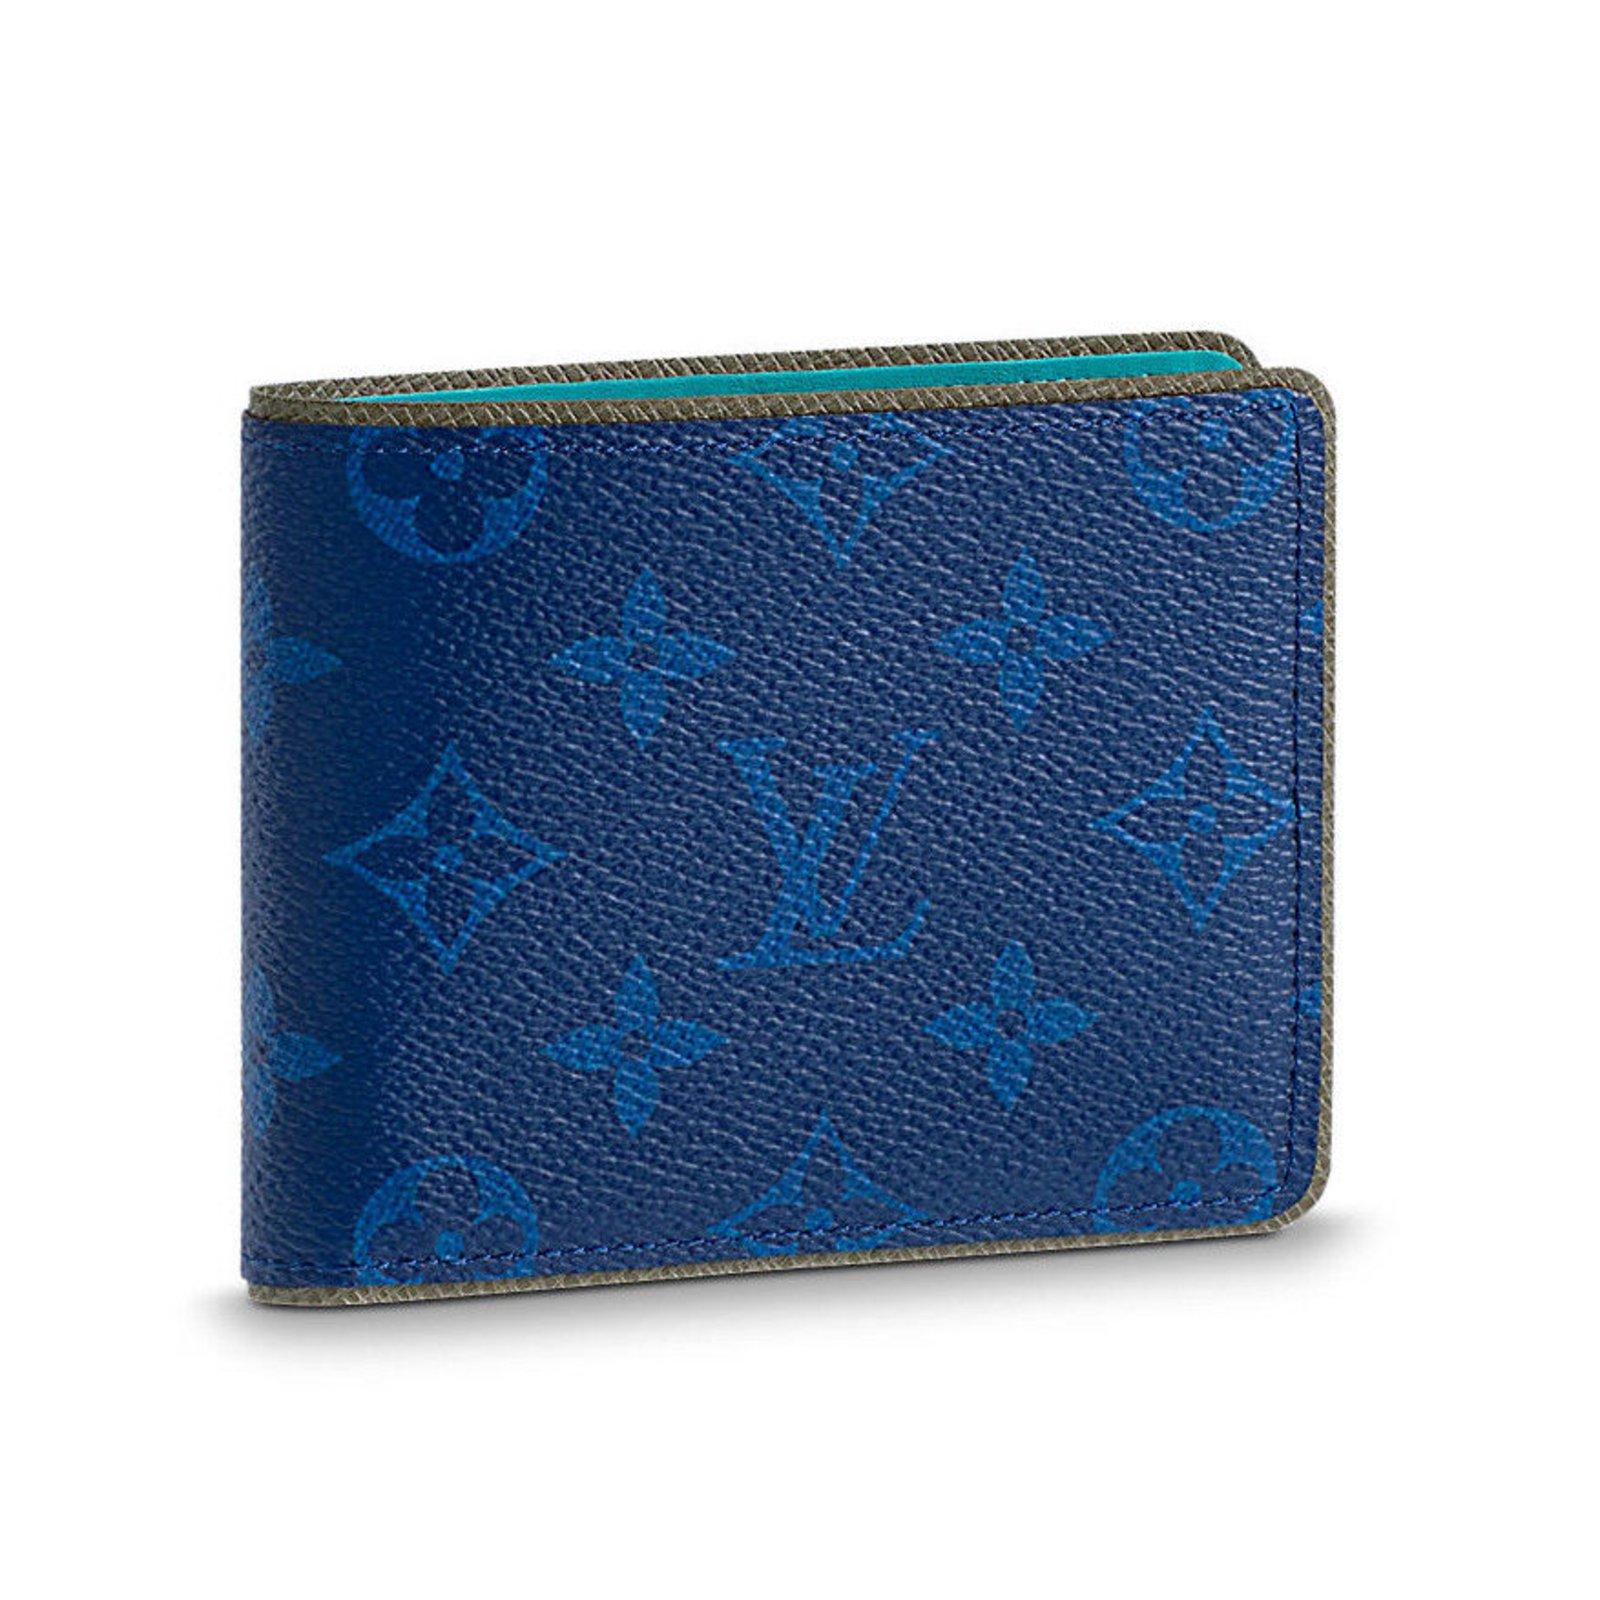 Wallets Vuitton for men new photo